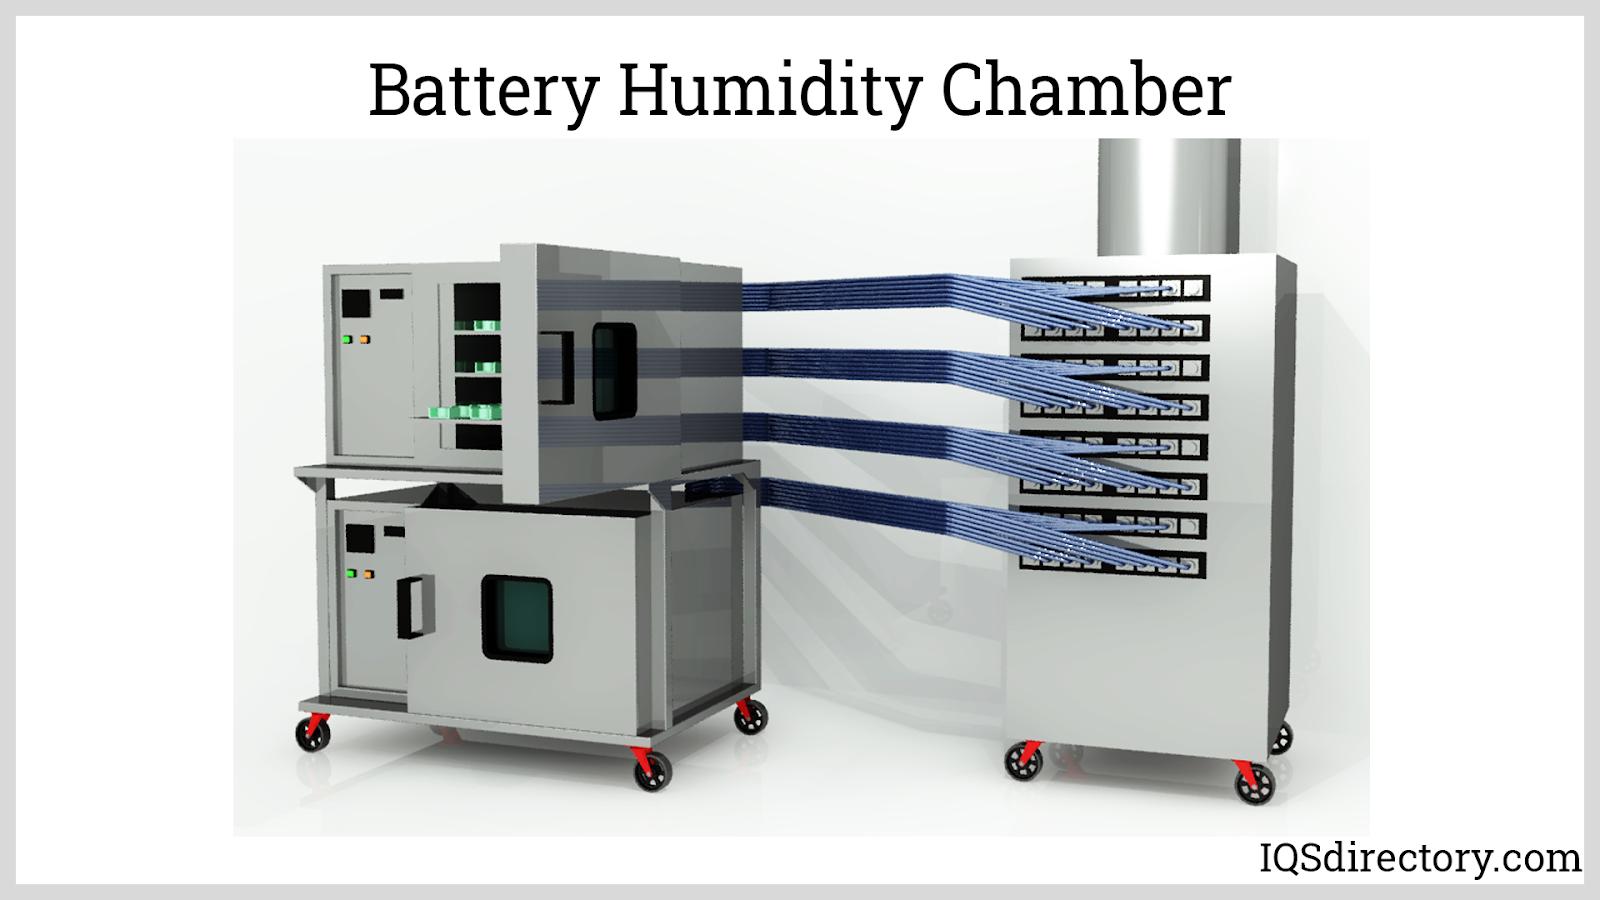 Battery Humidity Chamber